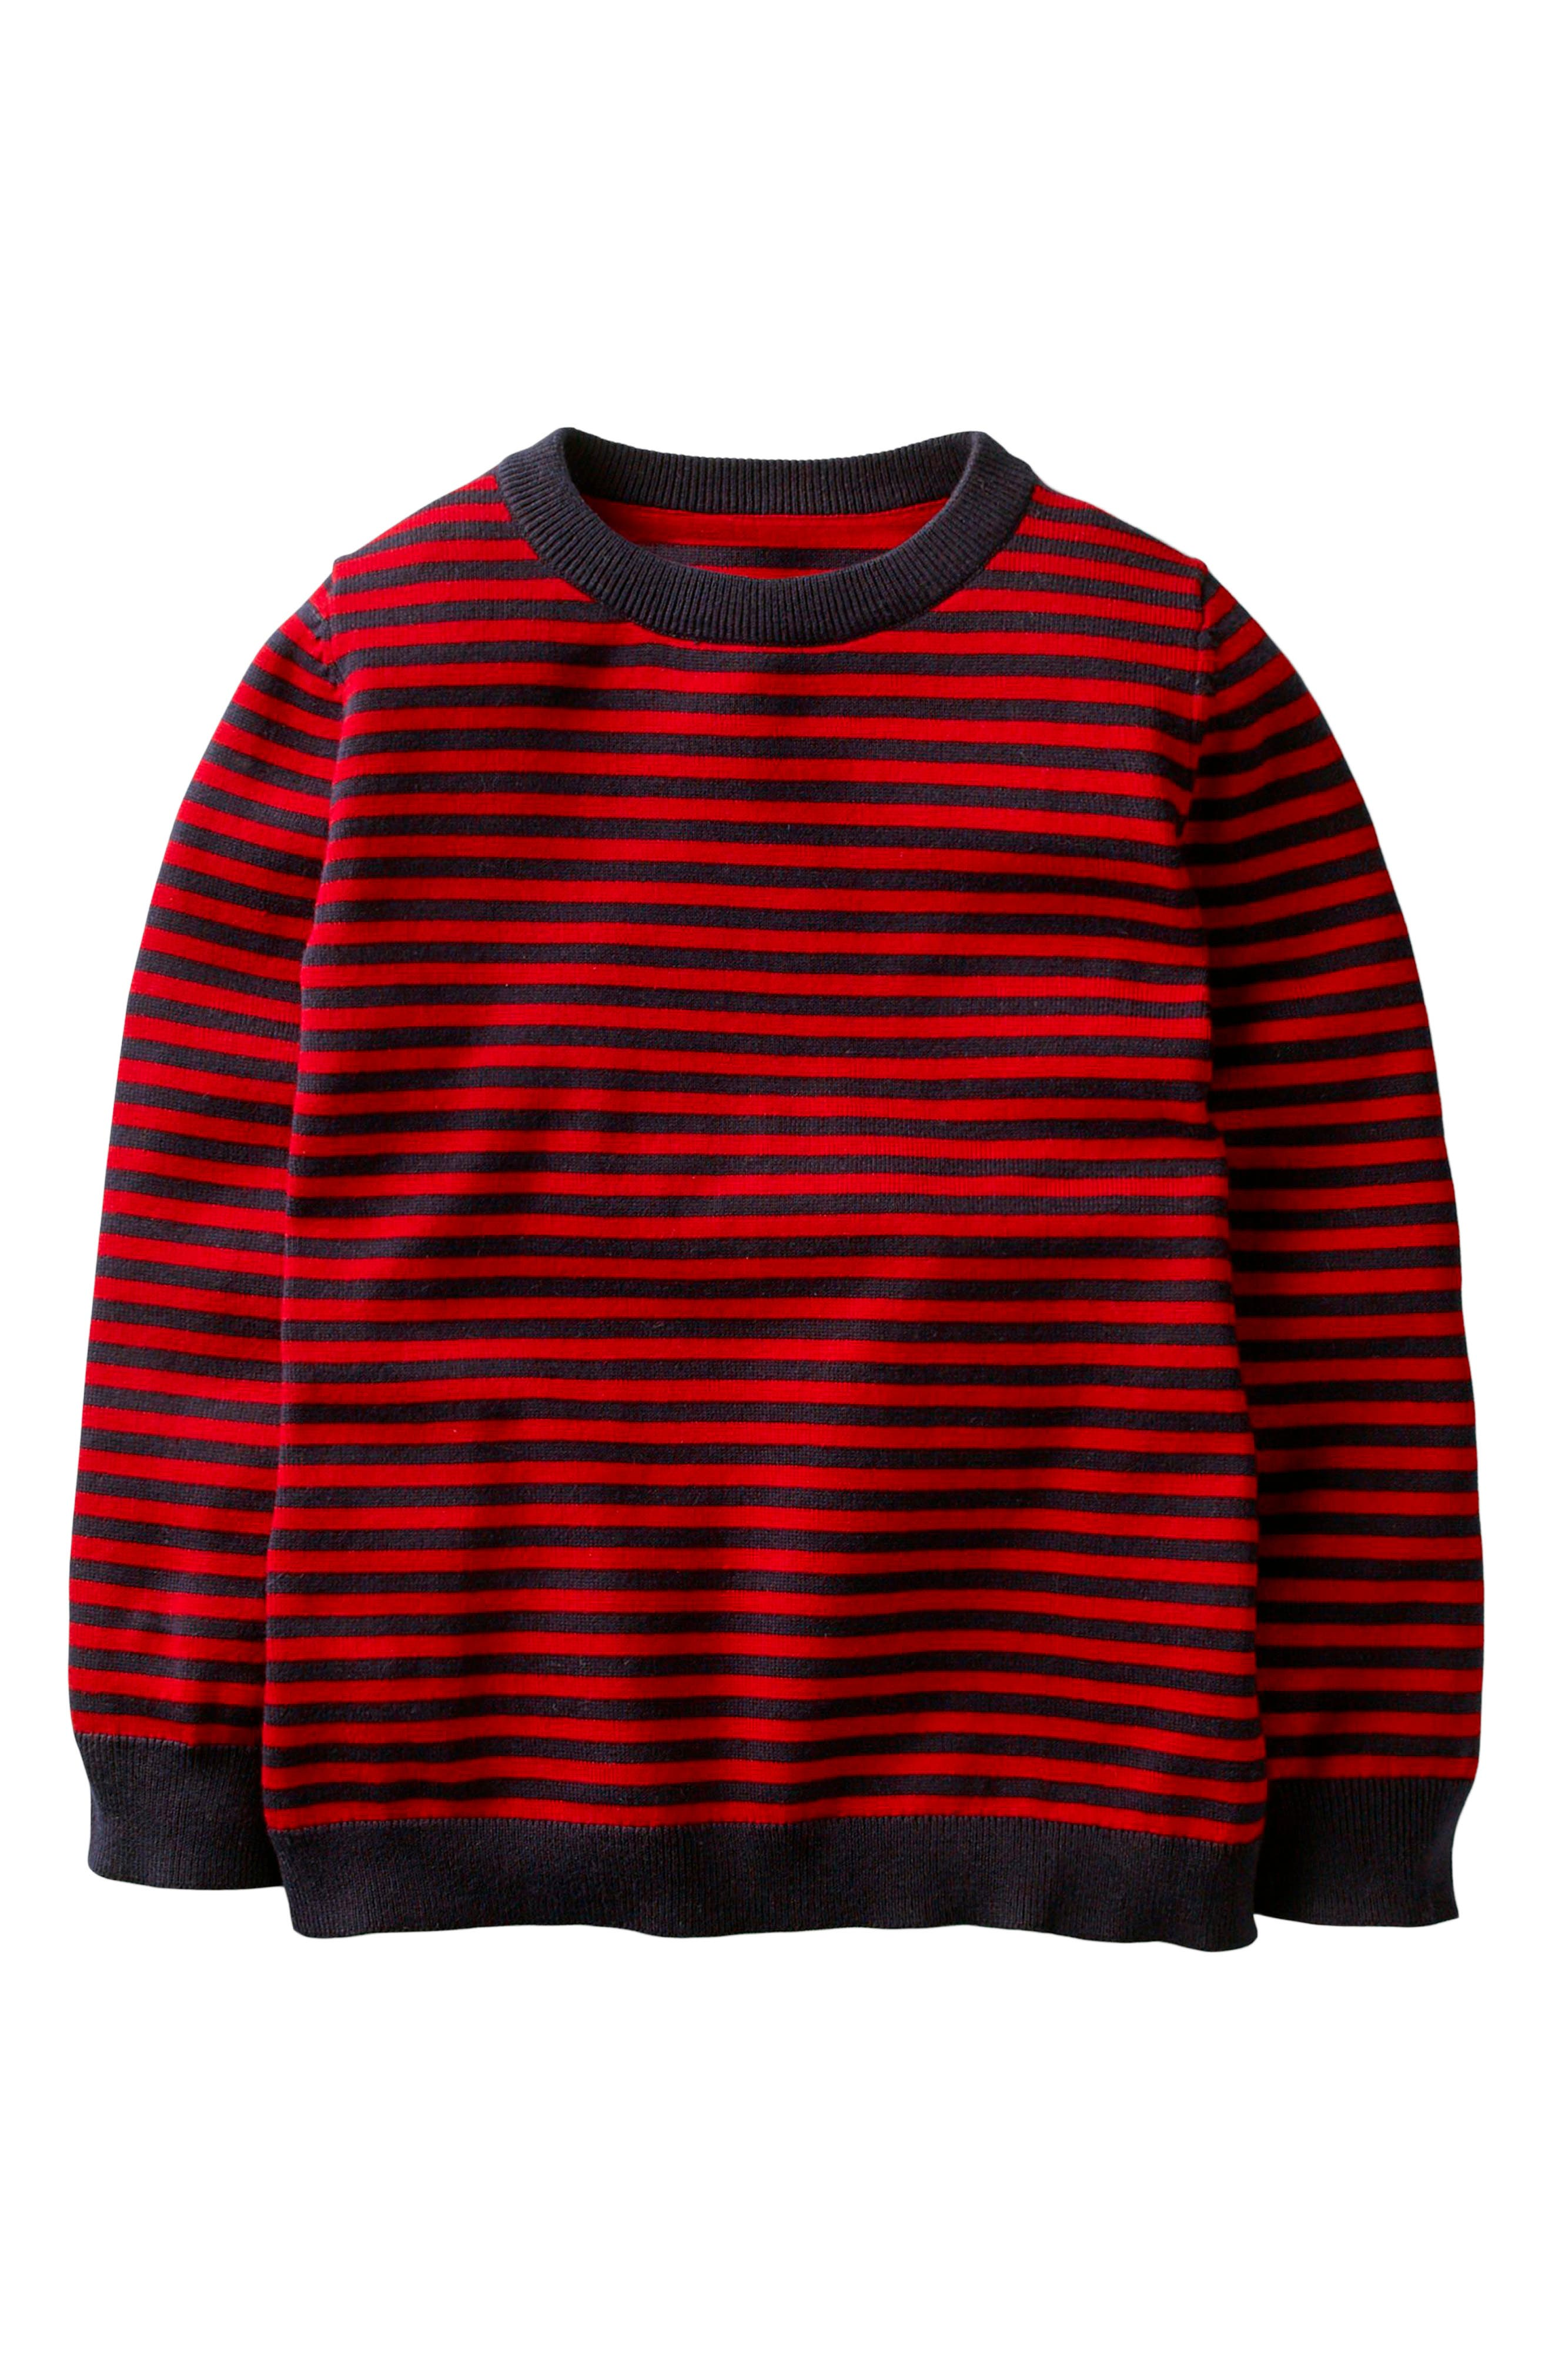 Mini Boden Cotton & Cashmere Sweater (Toddler Boys, Little Boys & Big Boys)